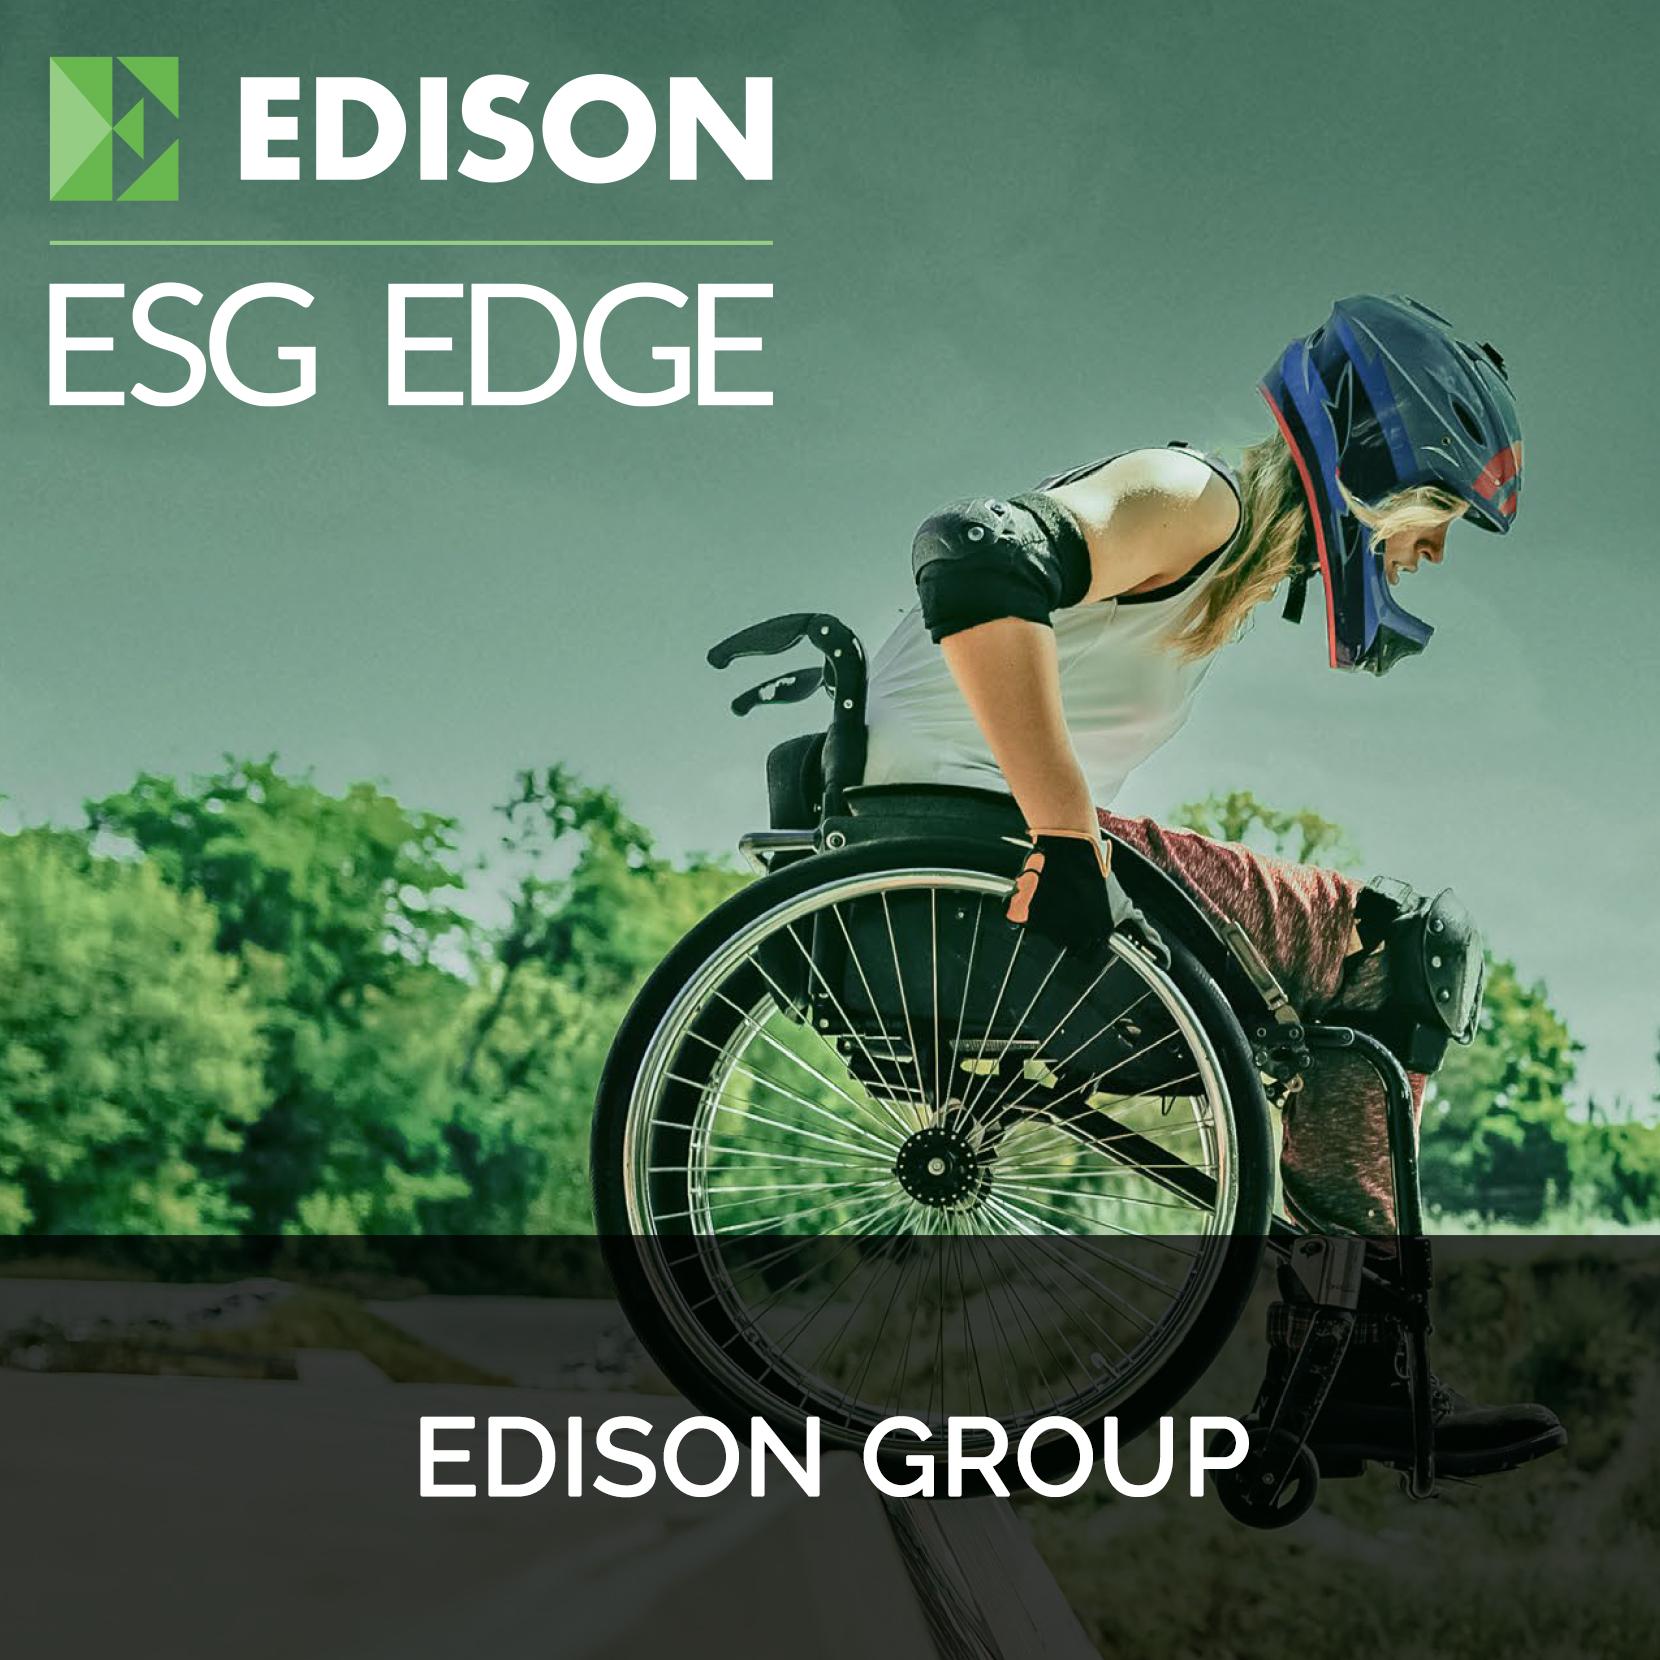 http://rusyndesign.co.uk/wp-content/uploads/2015/04/Work-square-Edison.jpg